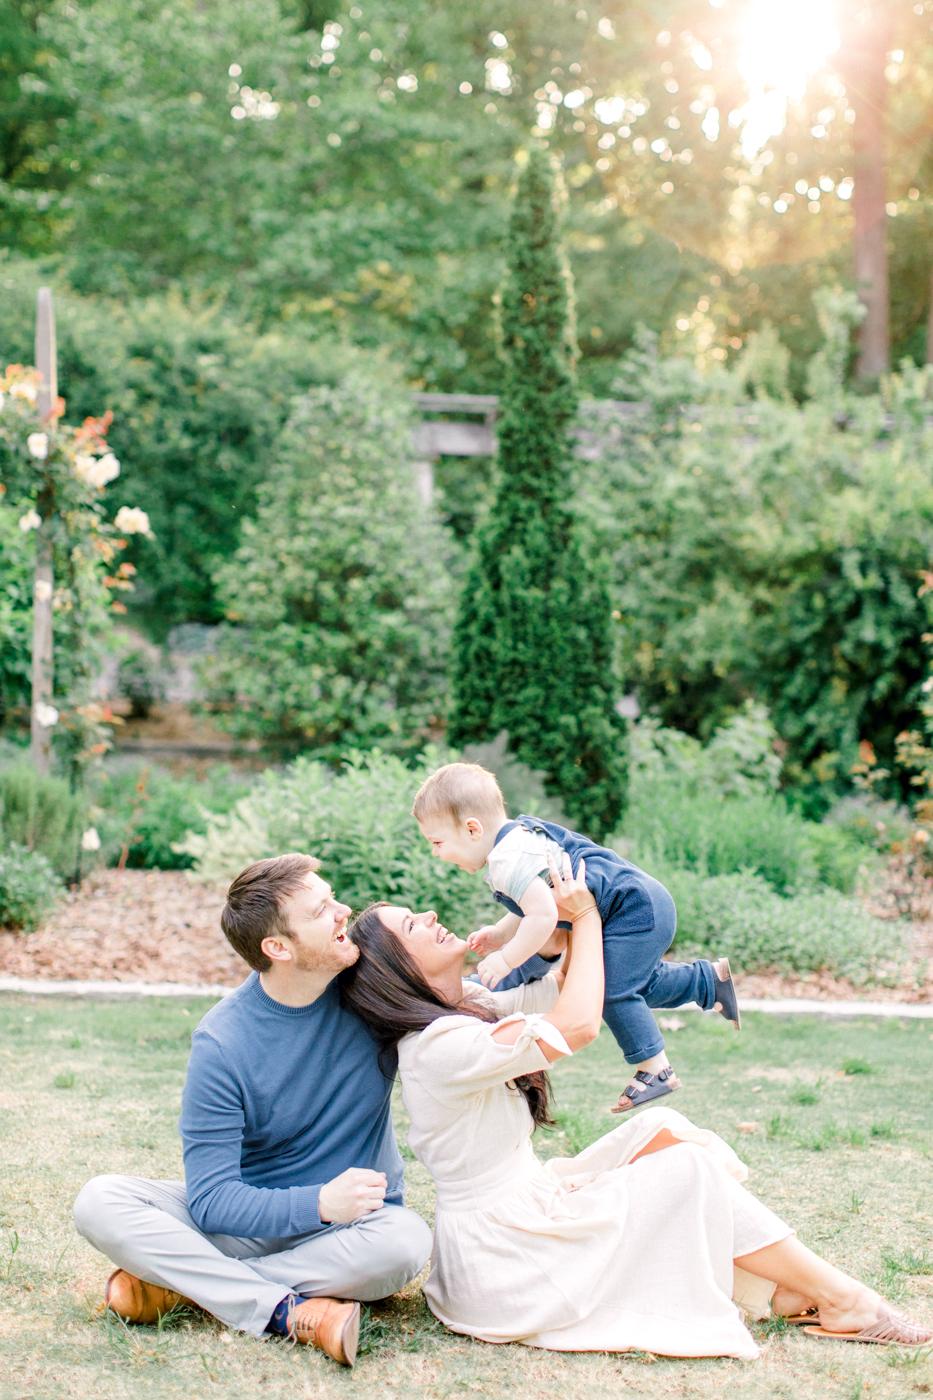 four corners photography atlanta family photographer athens family session family mini session atlanta decatur family photographer best atlanta photographer (6 of 18).jpg